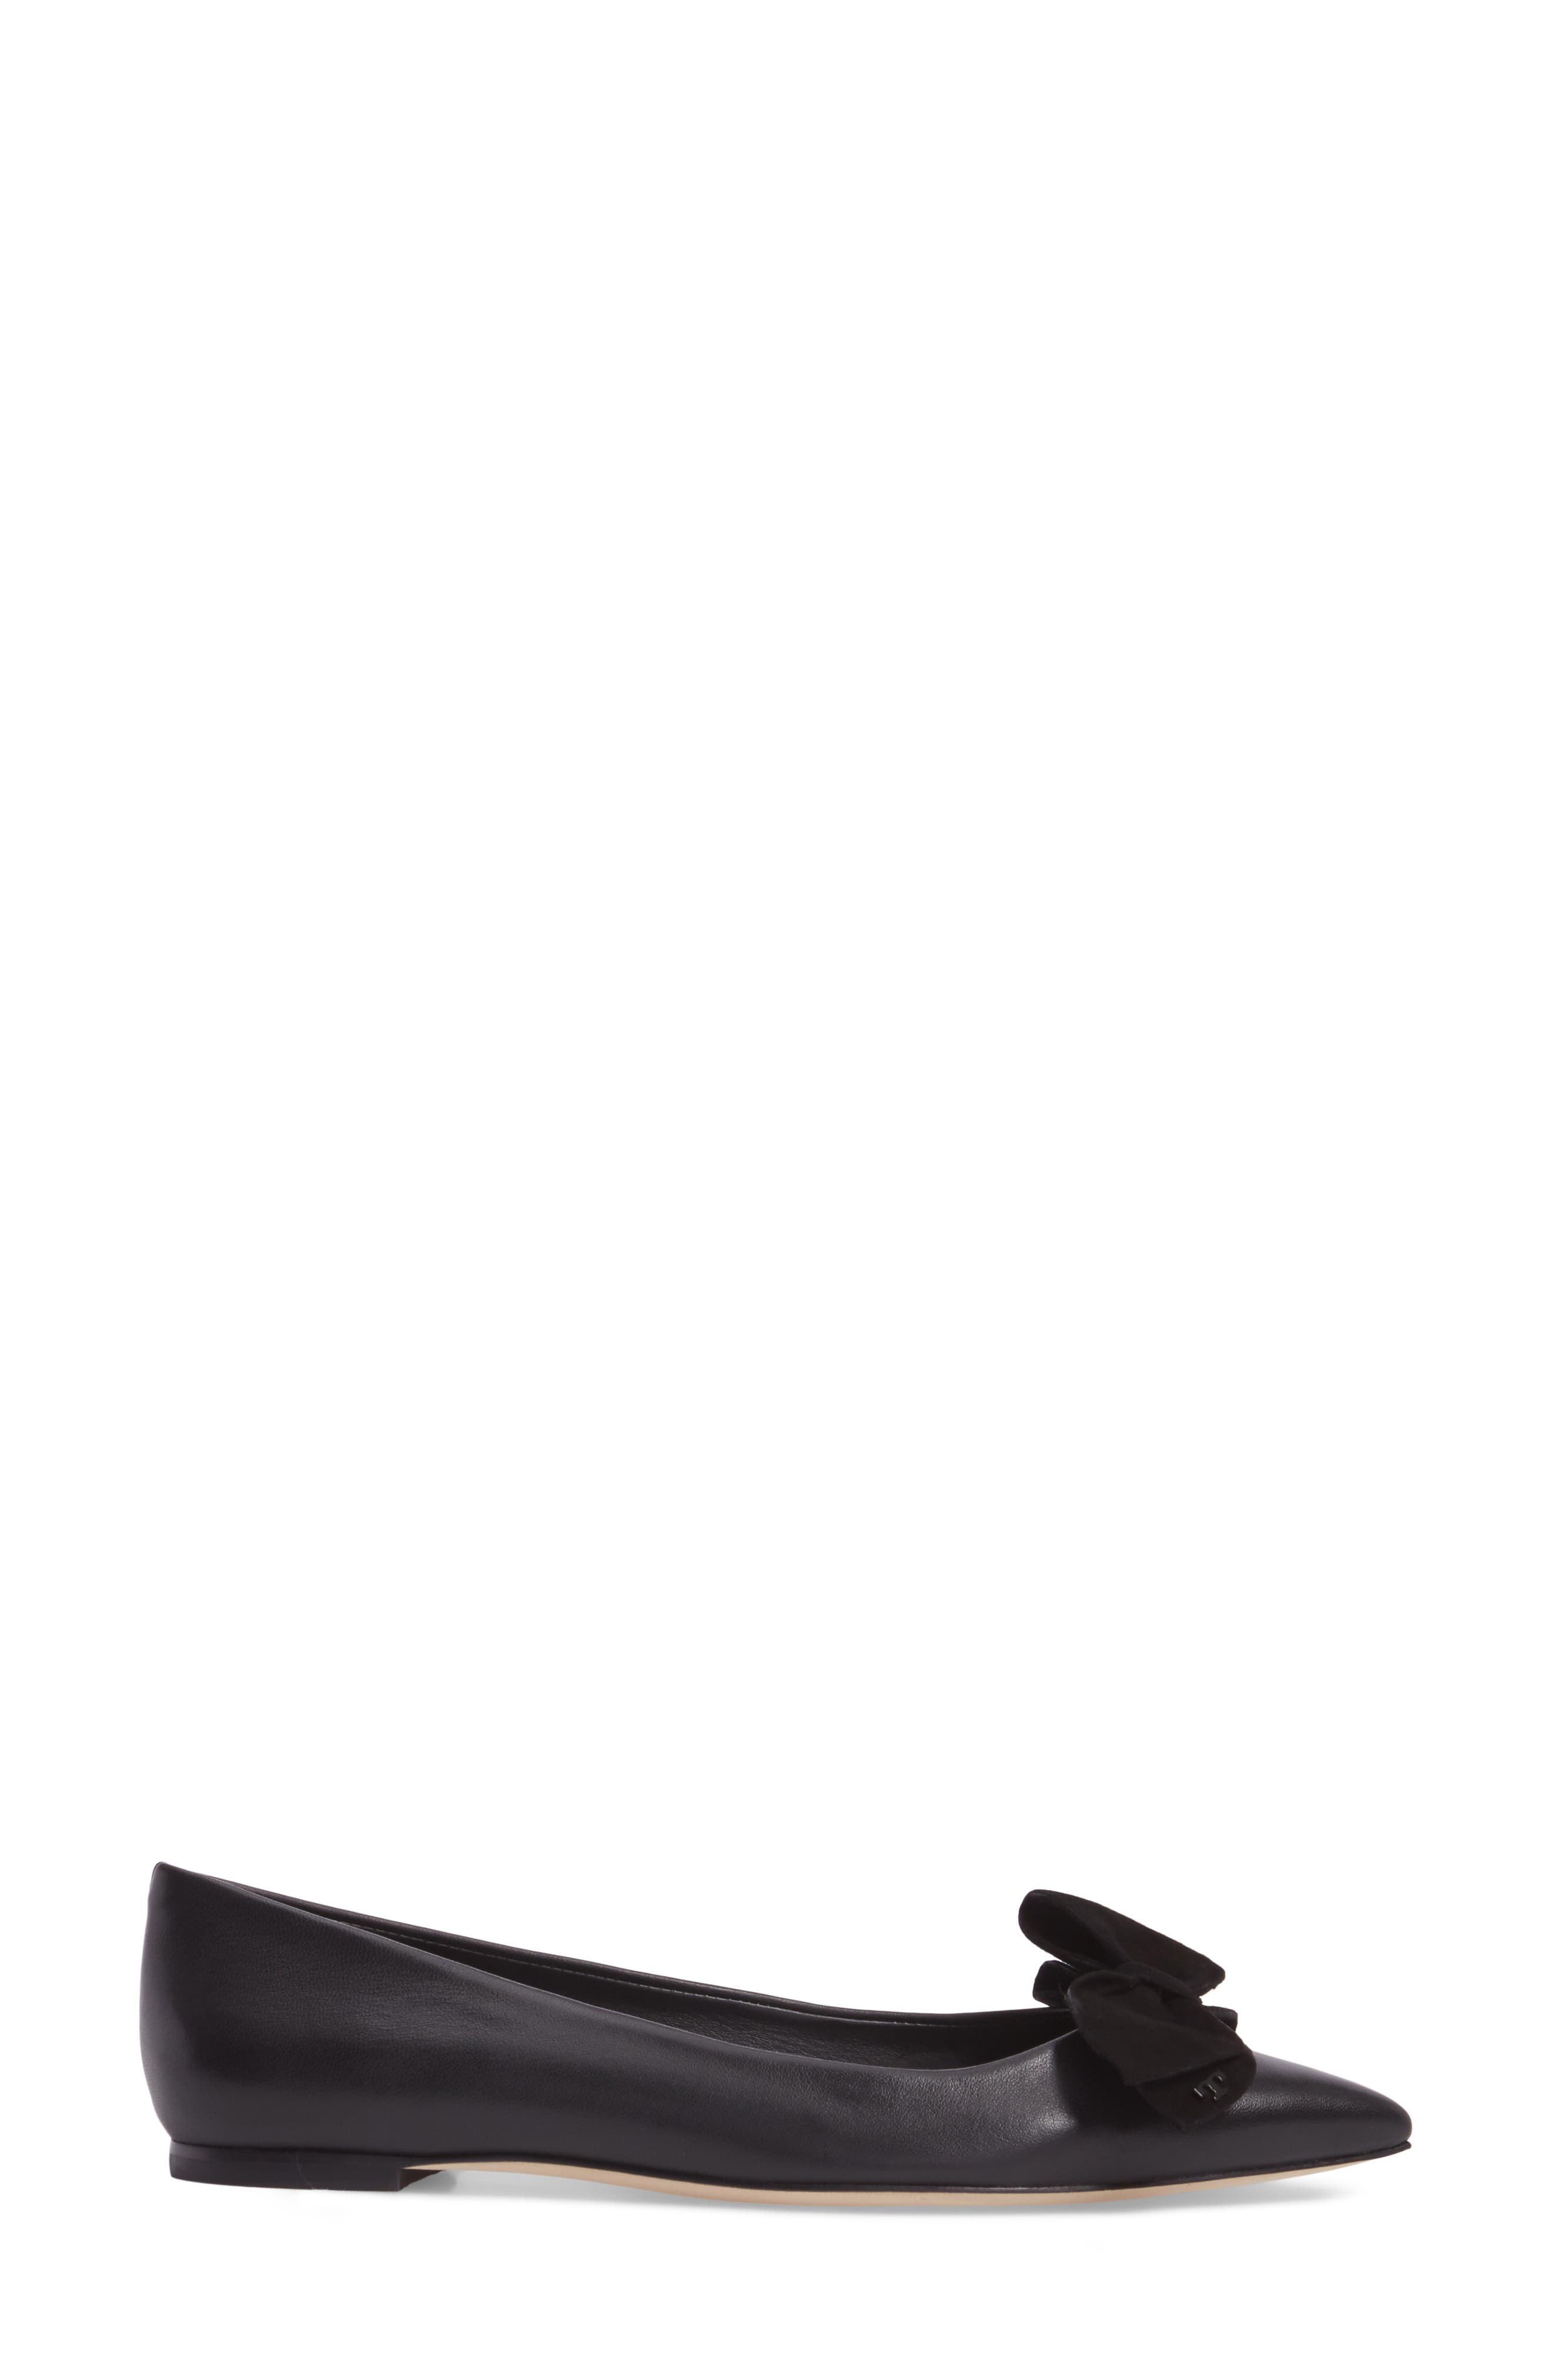 Alternate Image 3  - Tory Burch Rosalind Bow Pointy Toe Flat (Women)